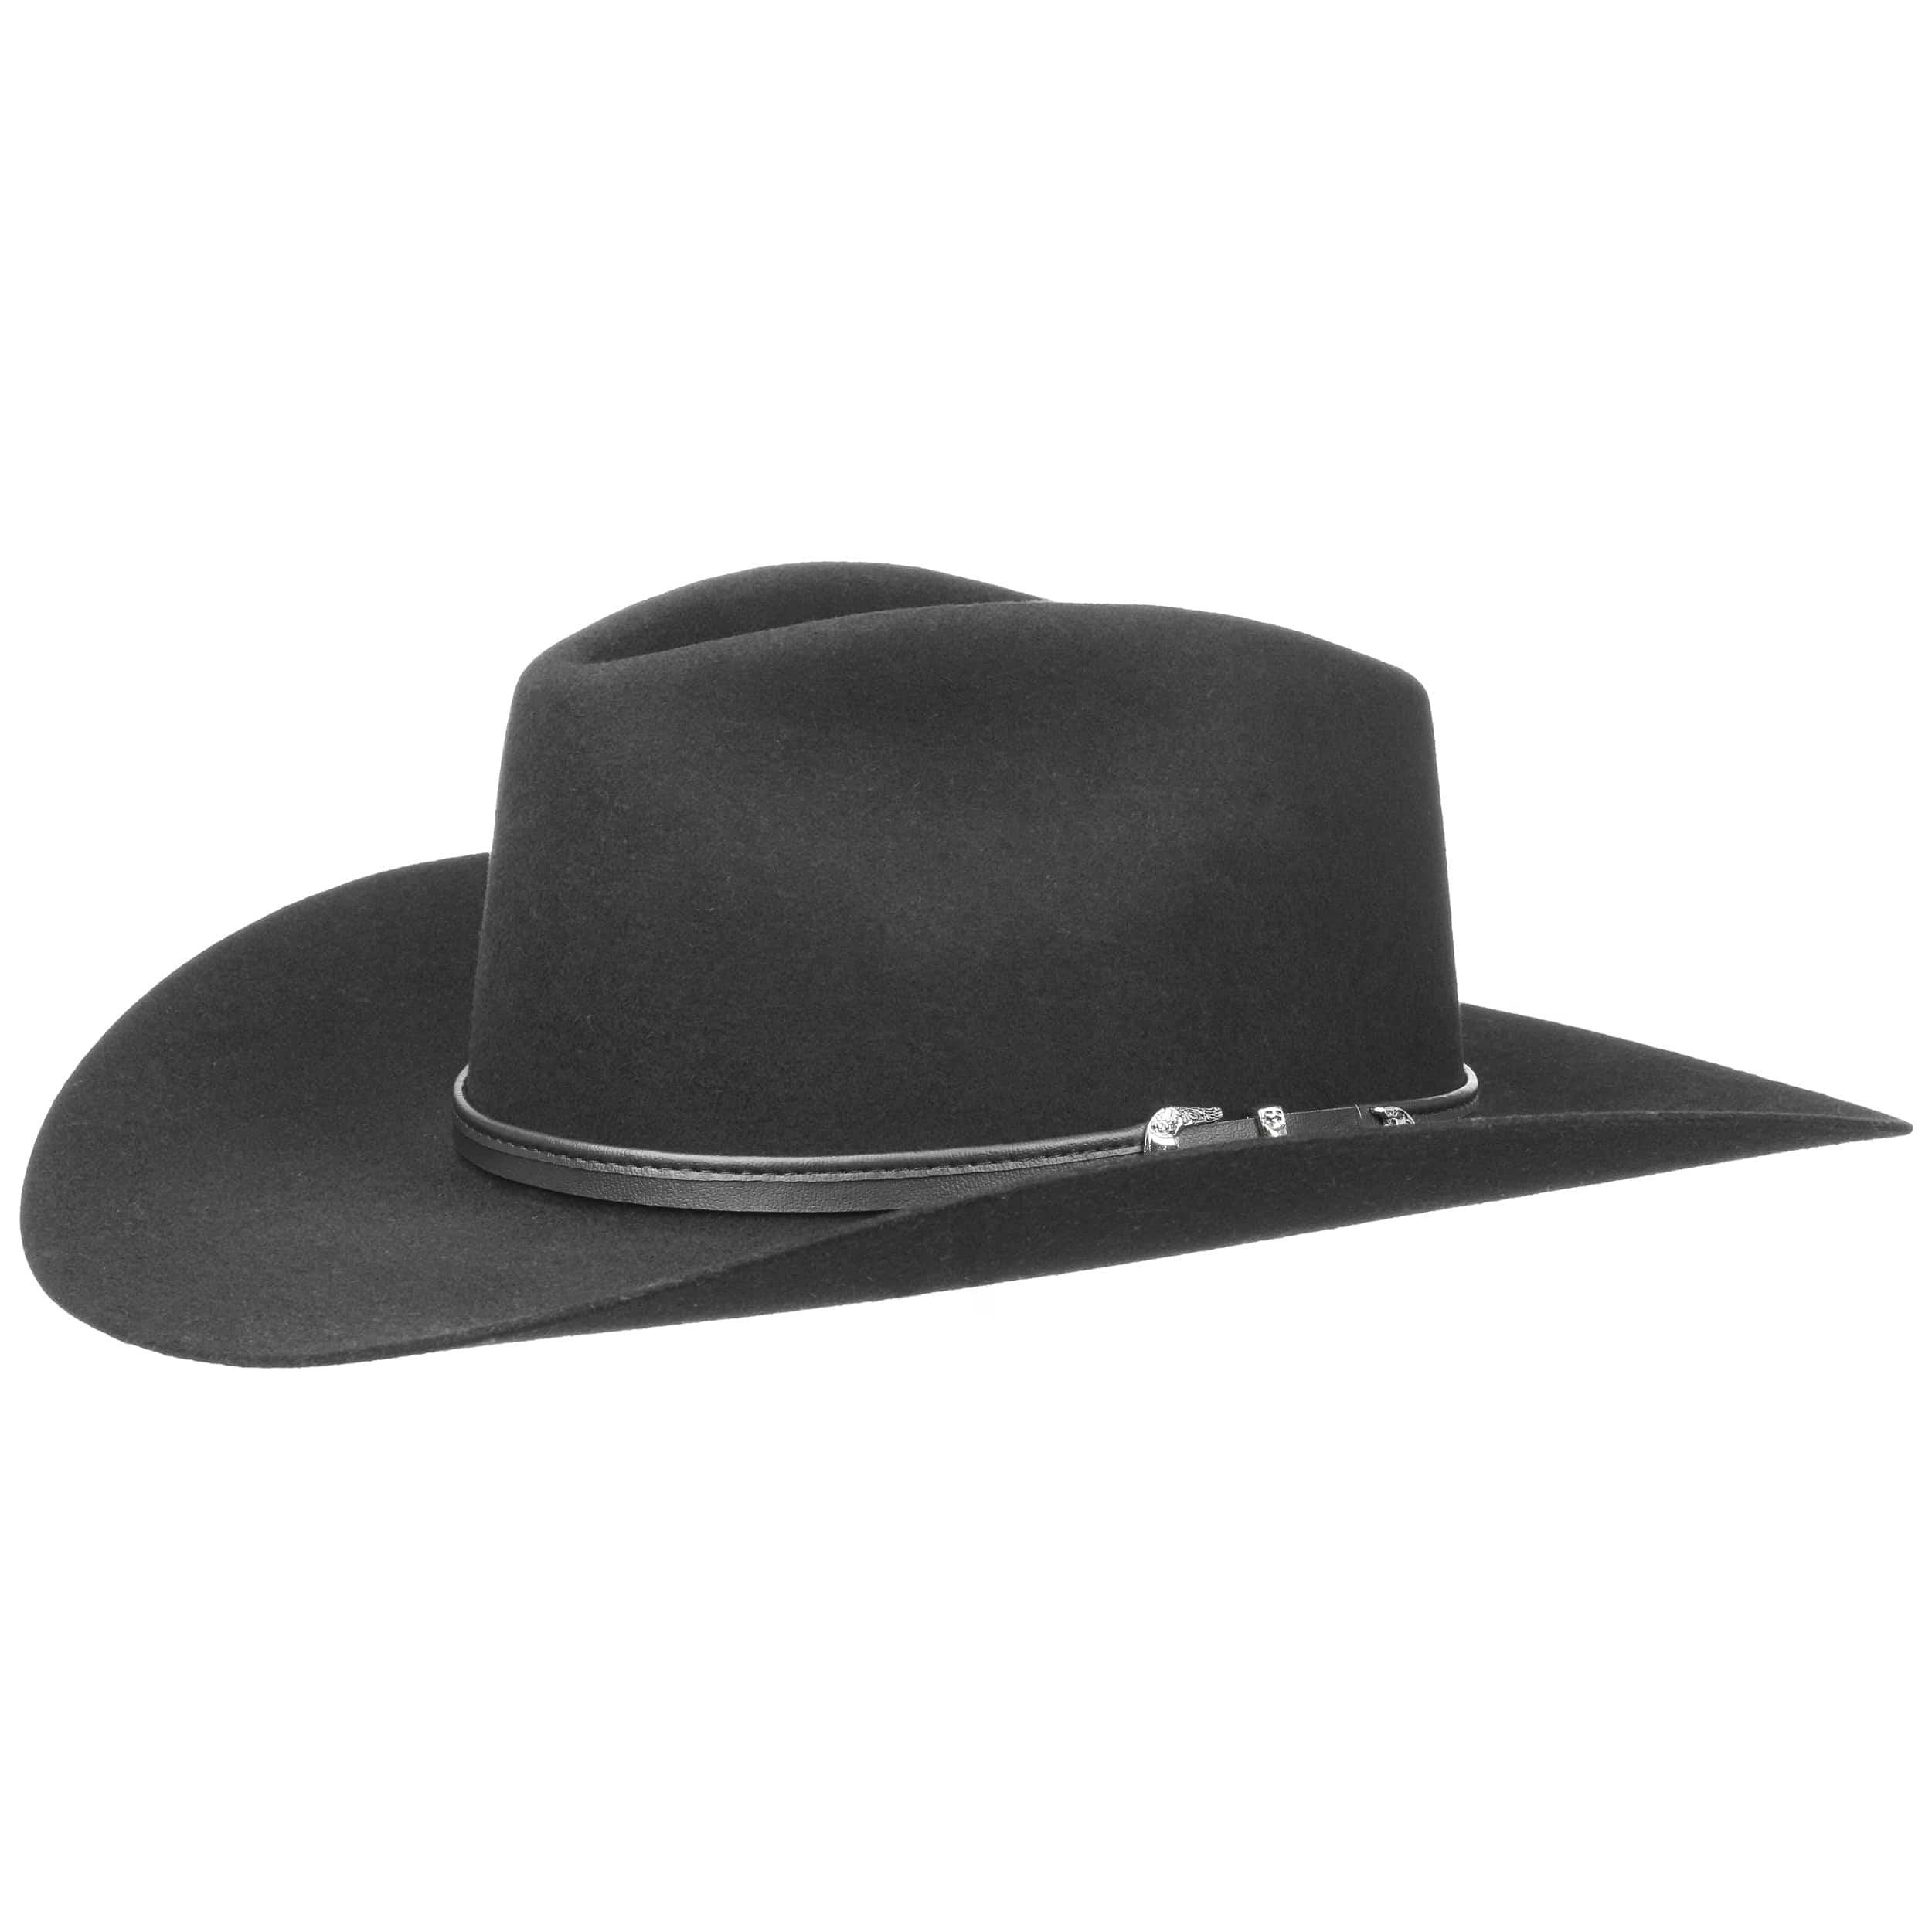 ... Cappello da Cowboy Seneca 4X by Stetson - nero 4 ... 76746aee2ec3